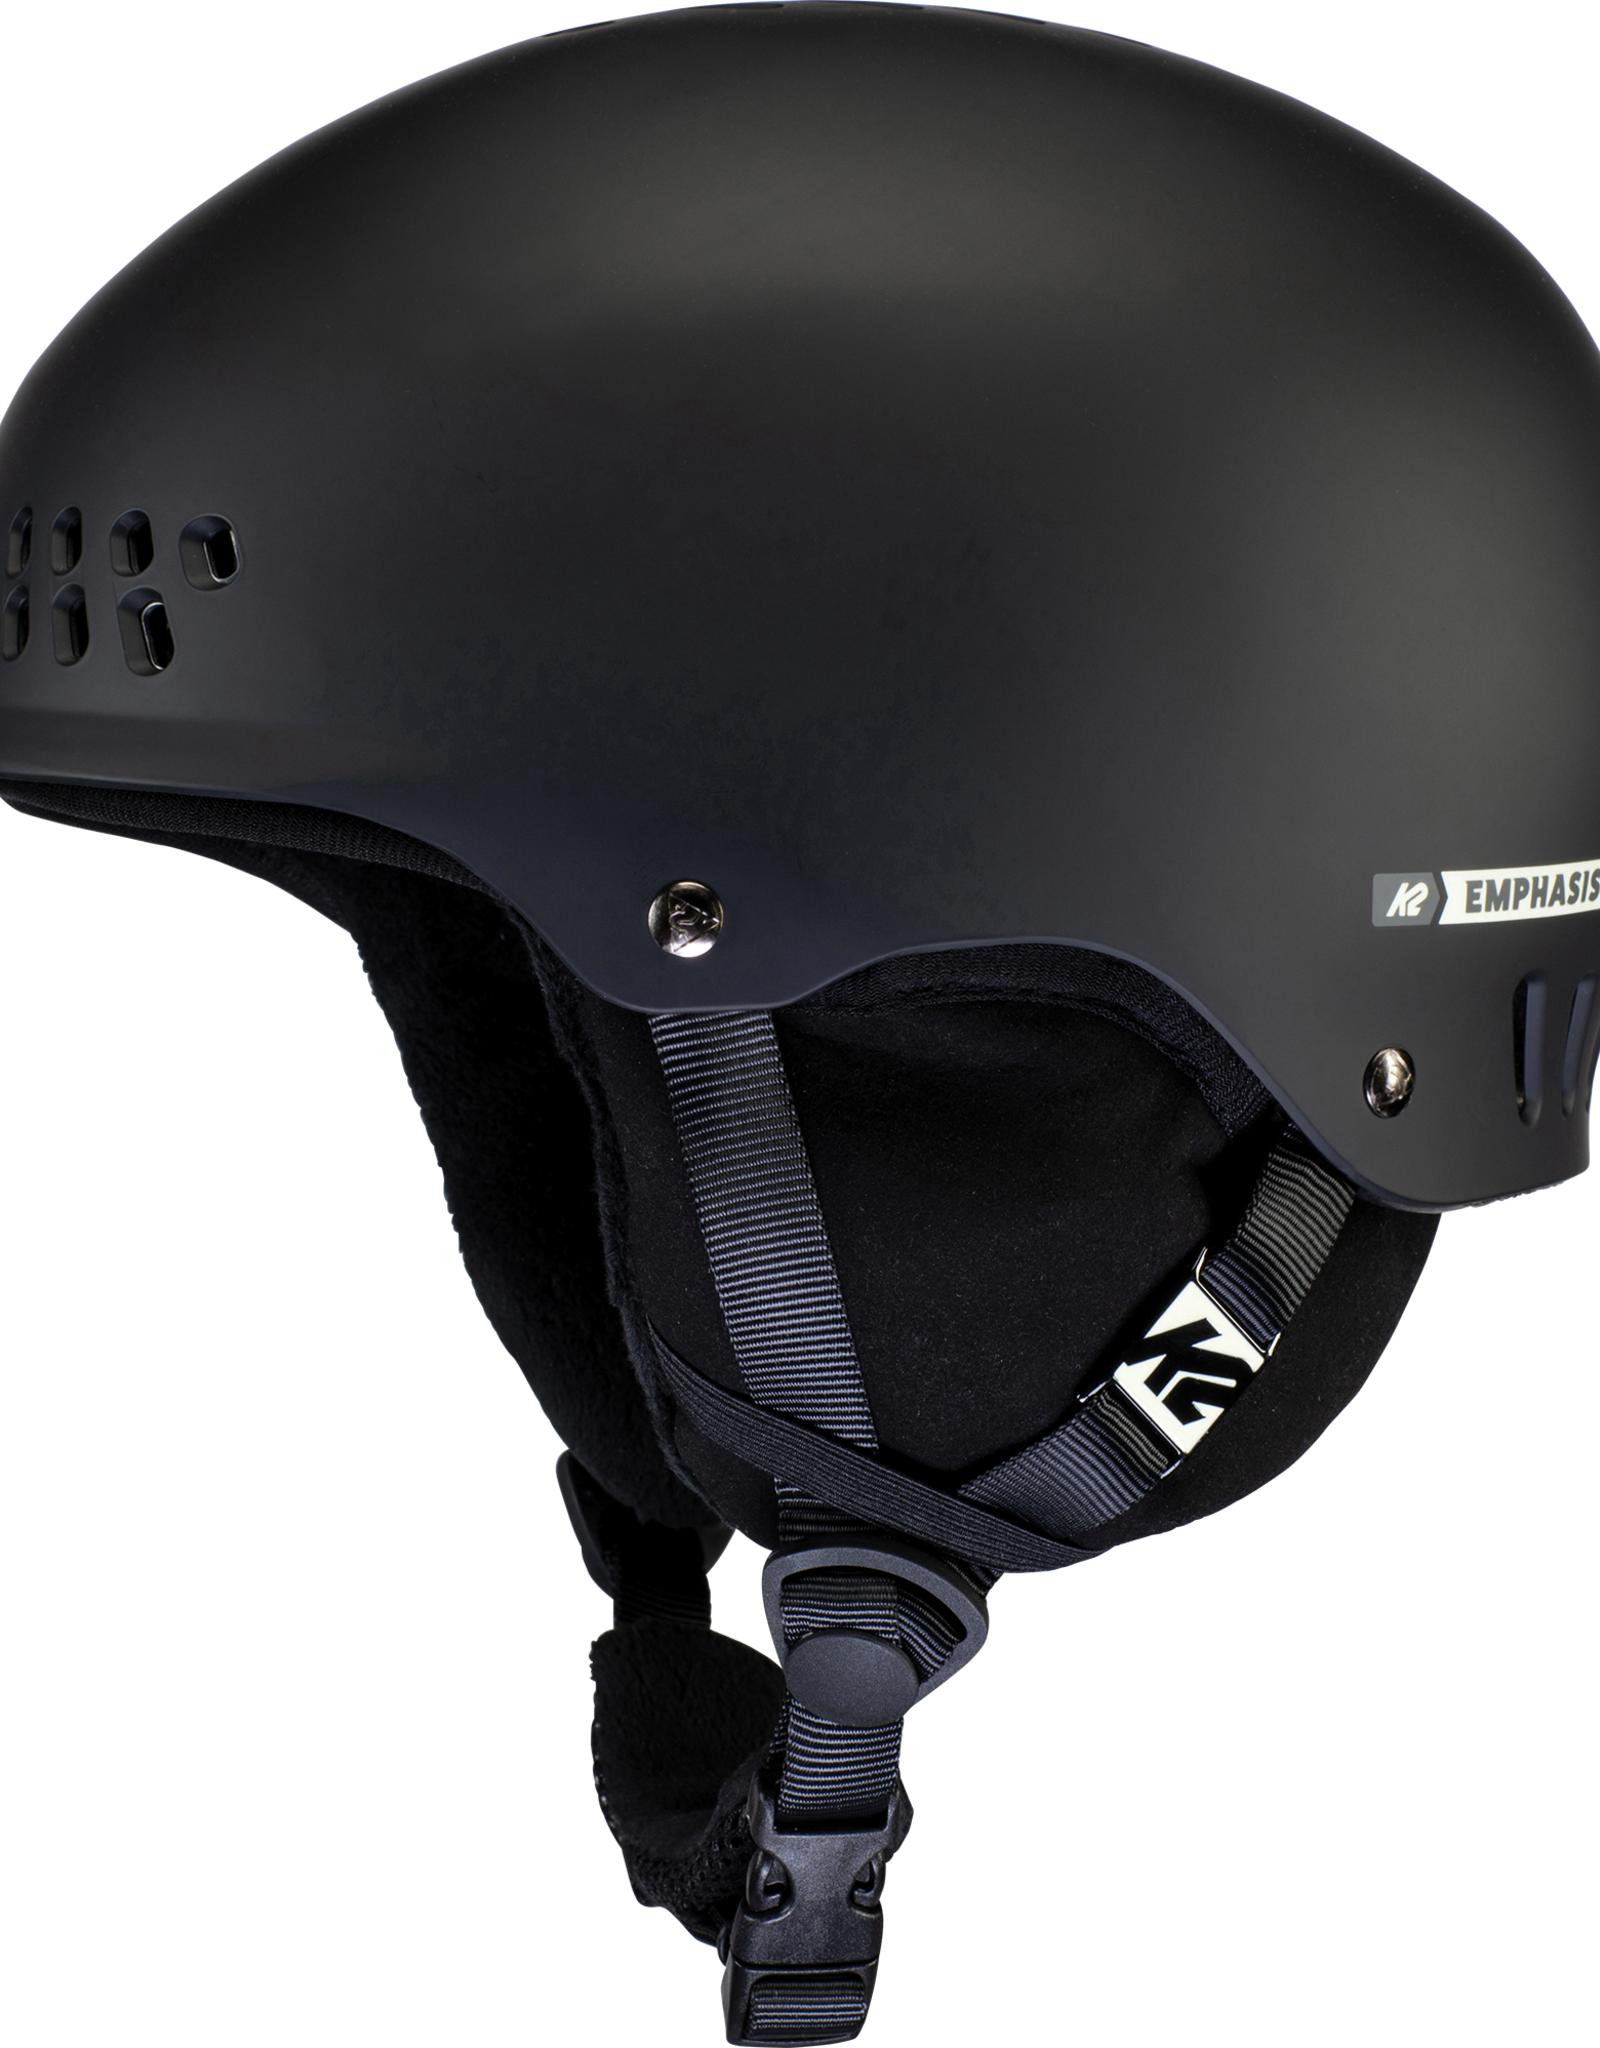 K2 K2 Snow Helmet EMPHASIS MIPS